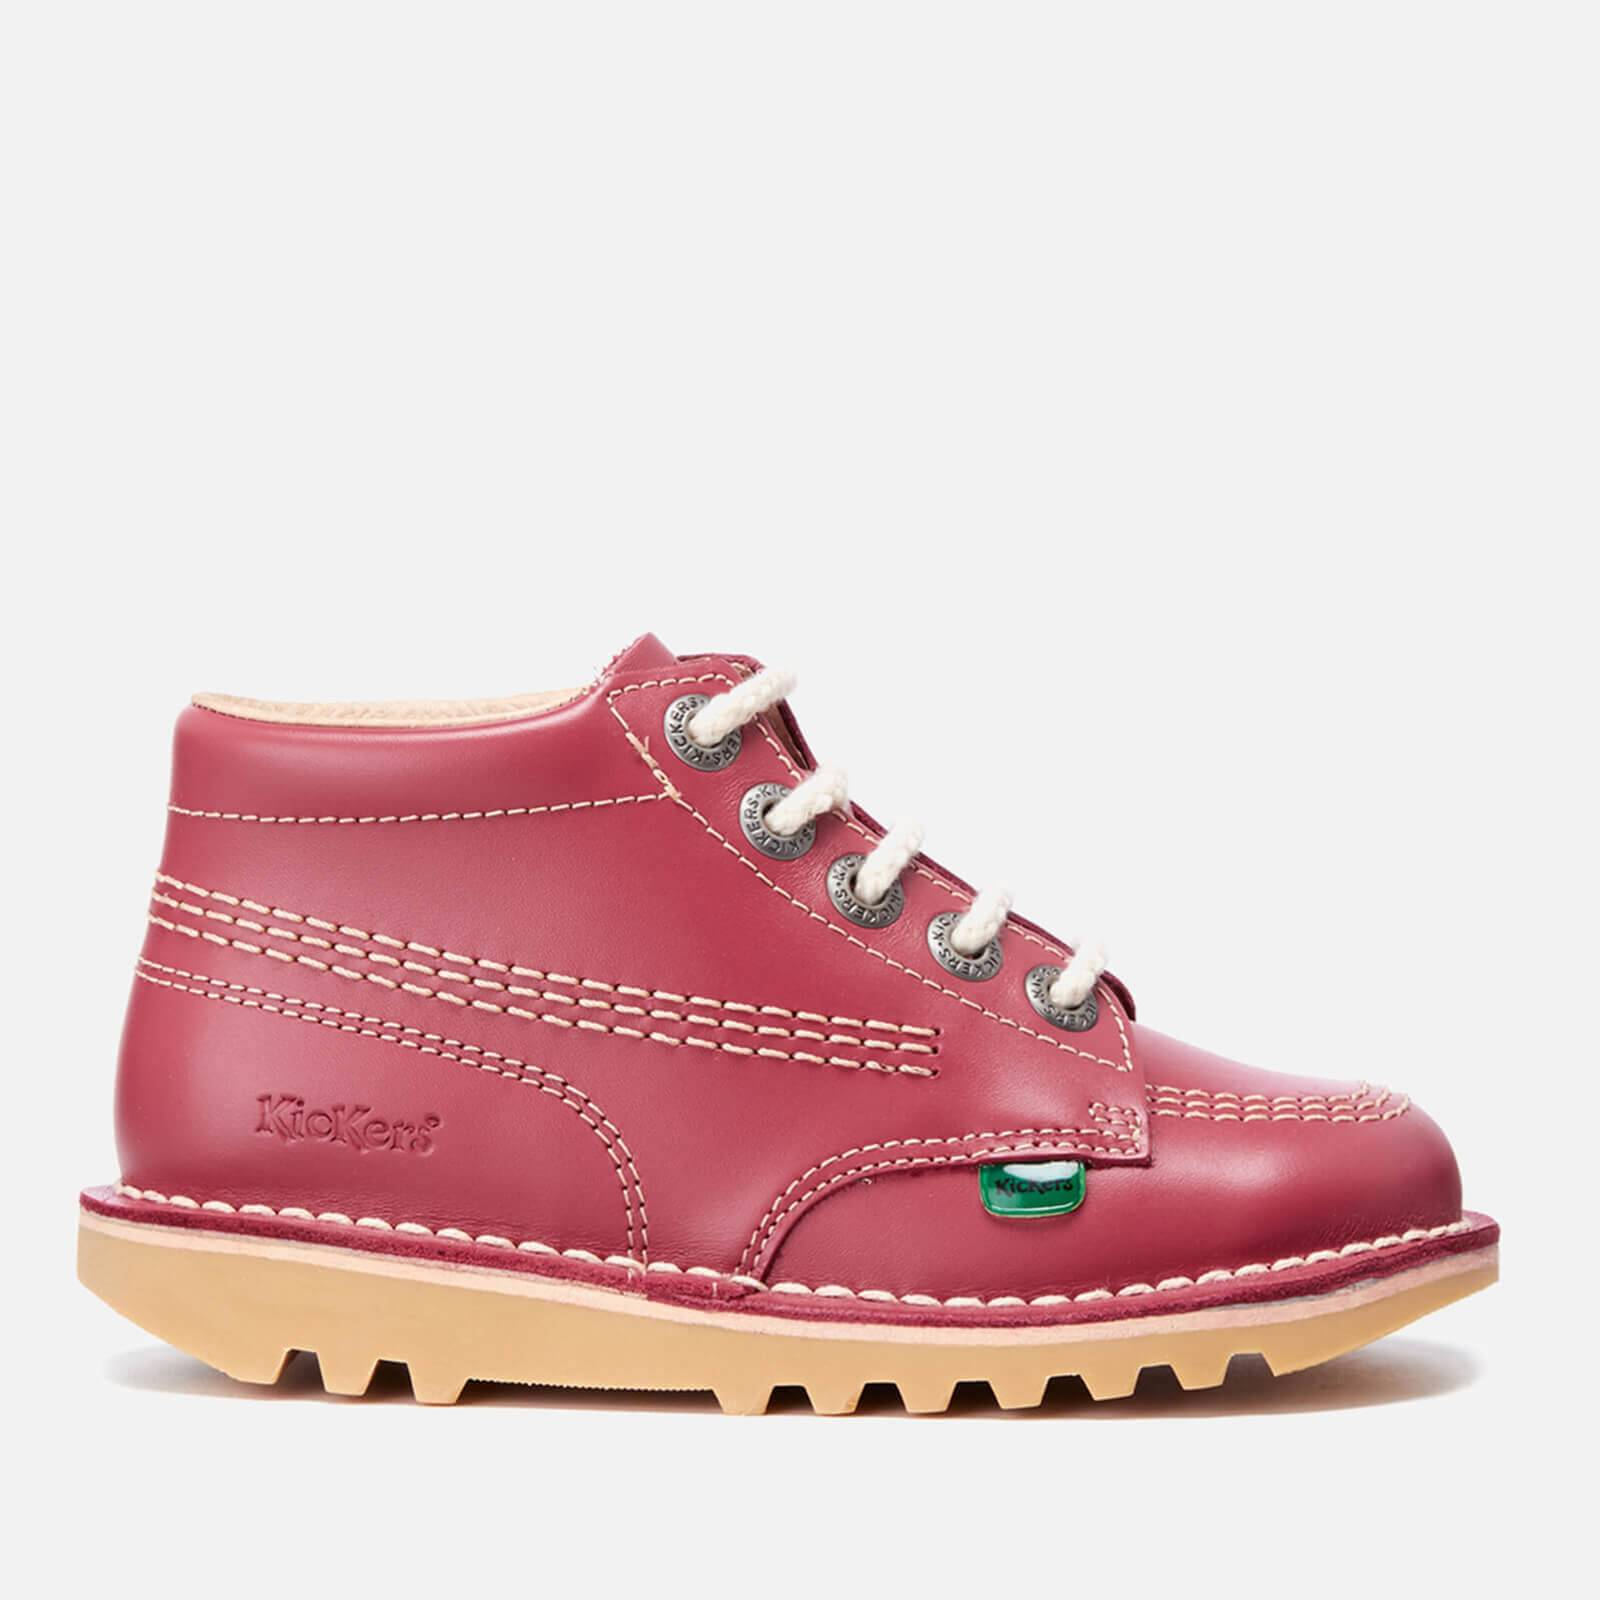 Kickers Kids' Kick Hi Boots - Blossom - UK 8 Infant/EU 25 - Pink